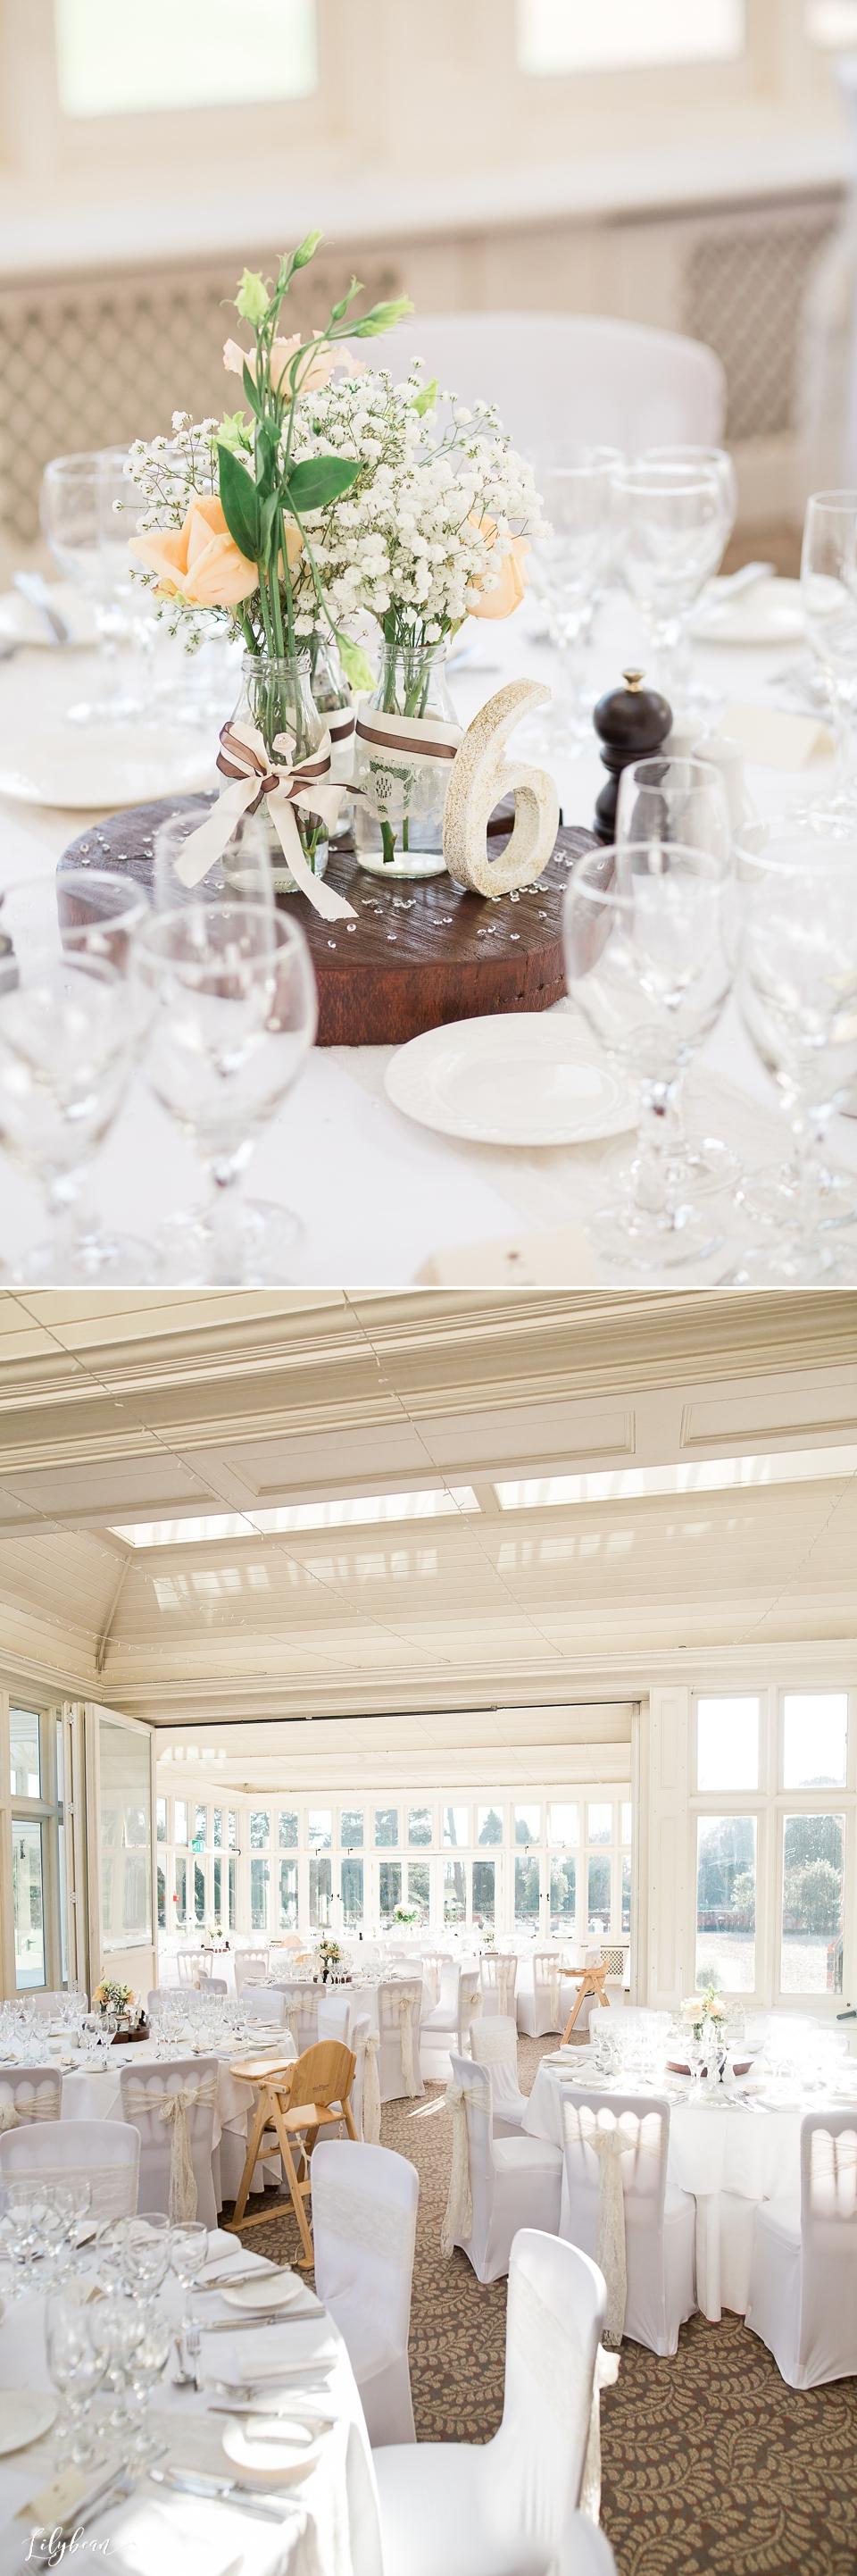 The Elvetham conservatory wedding breakfast decor